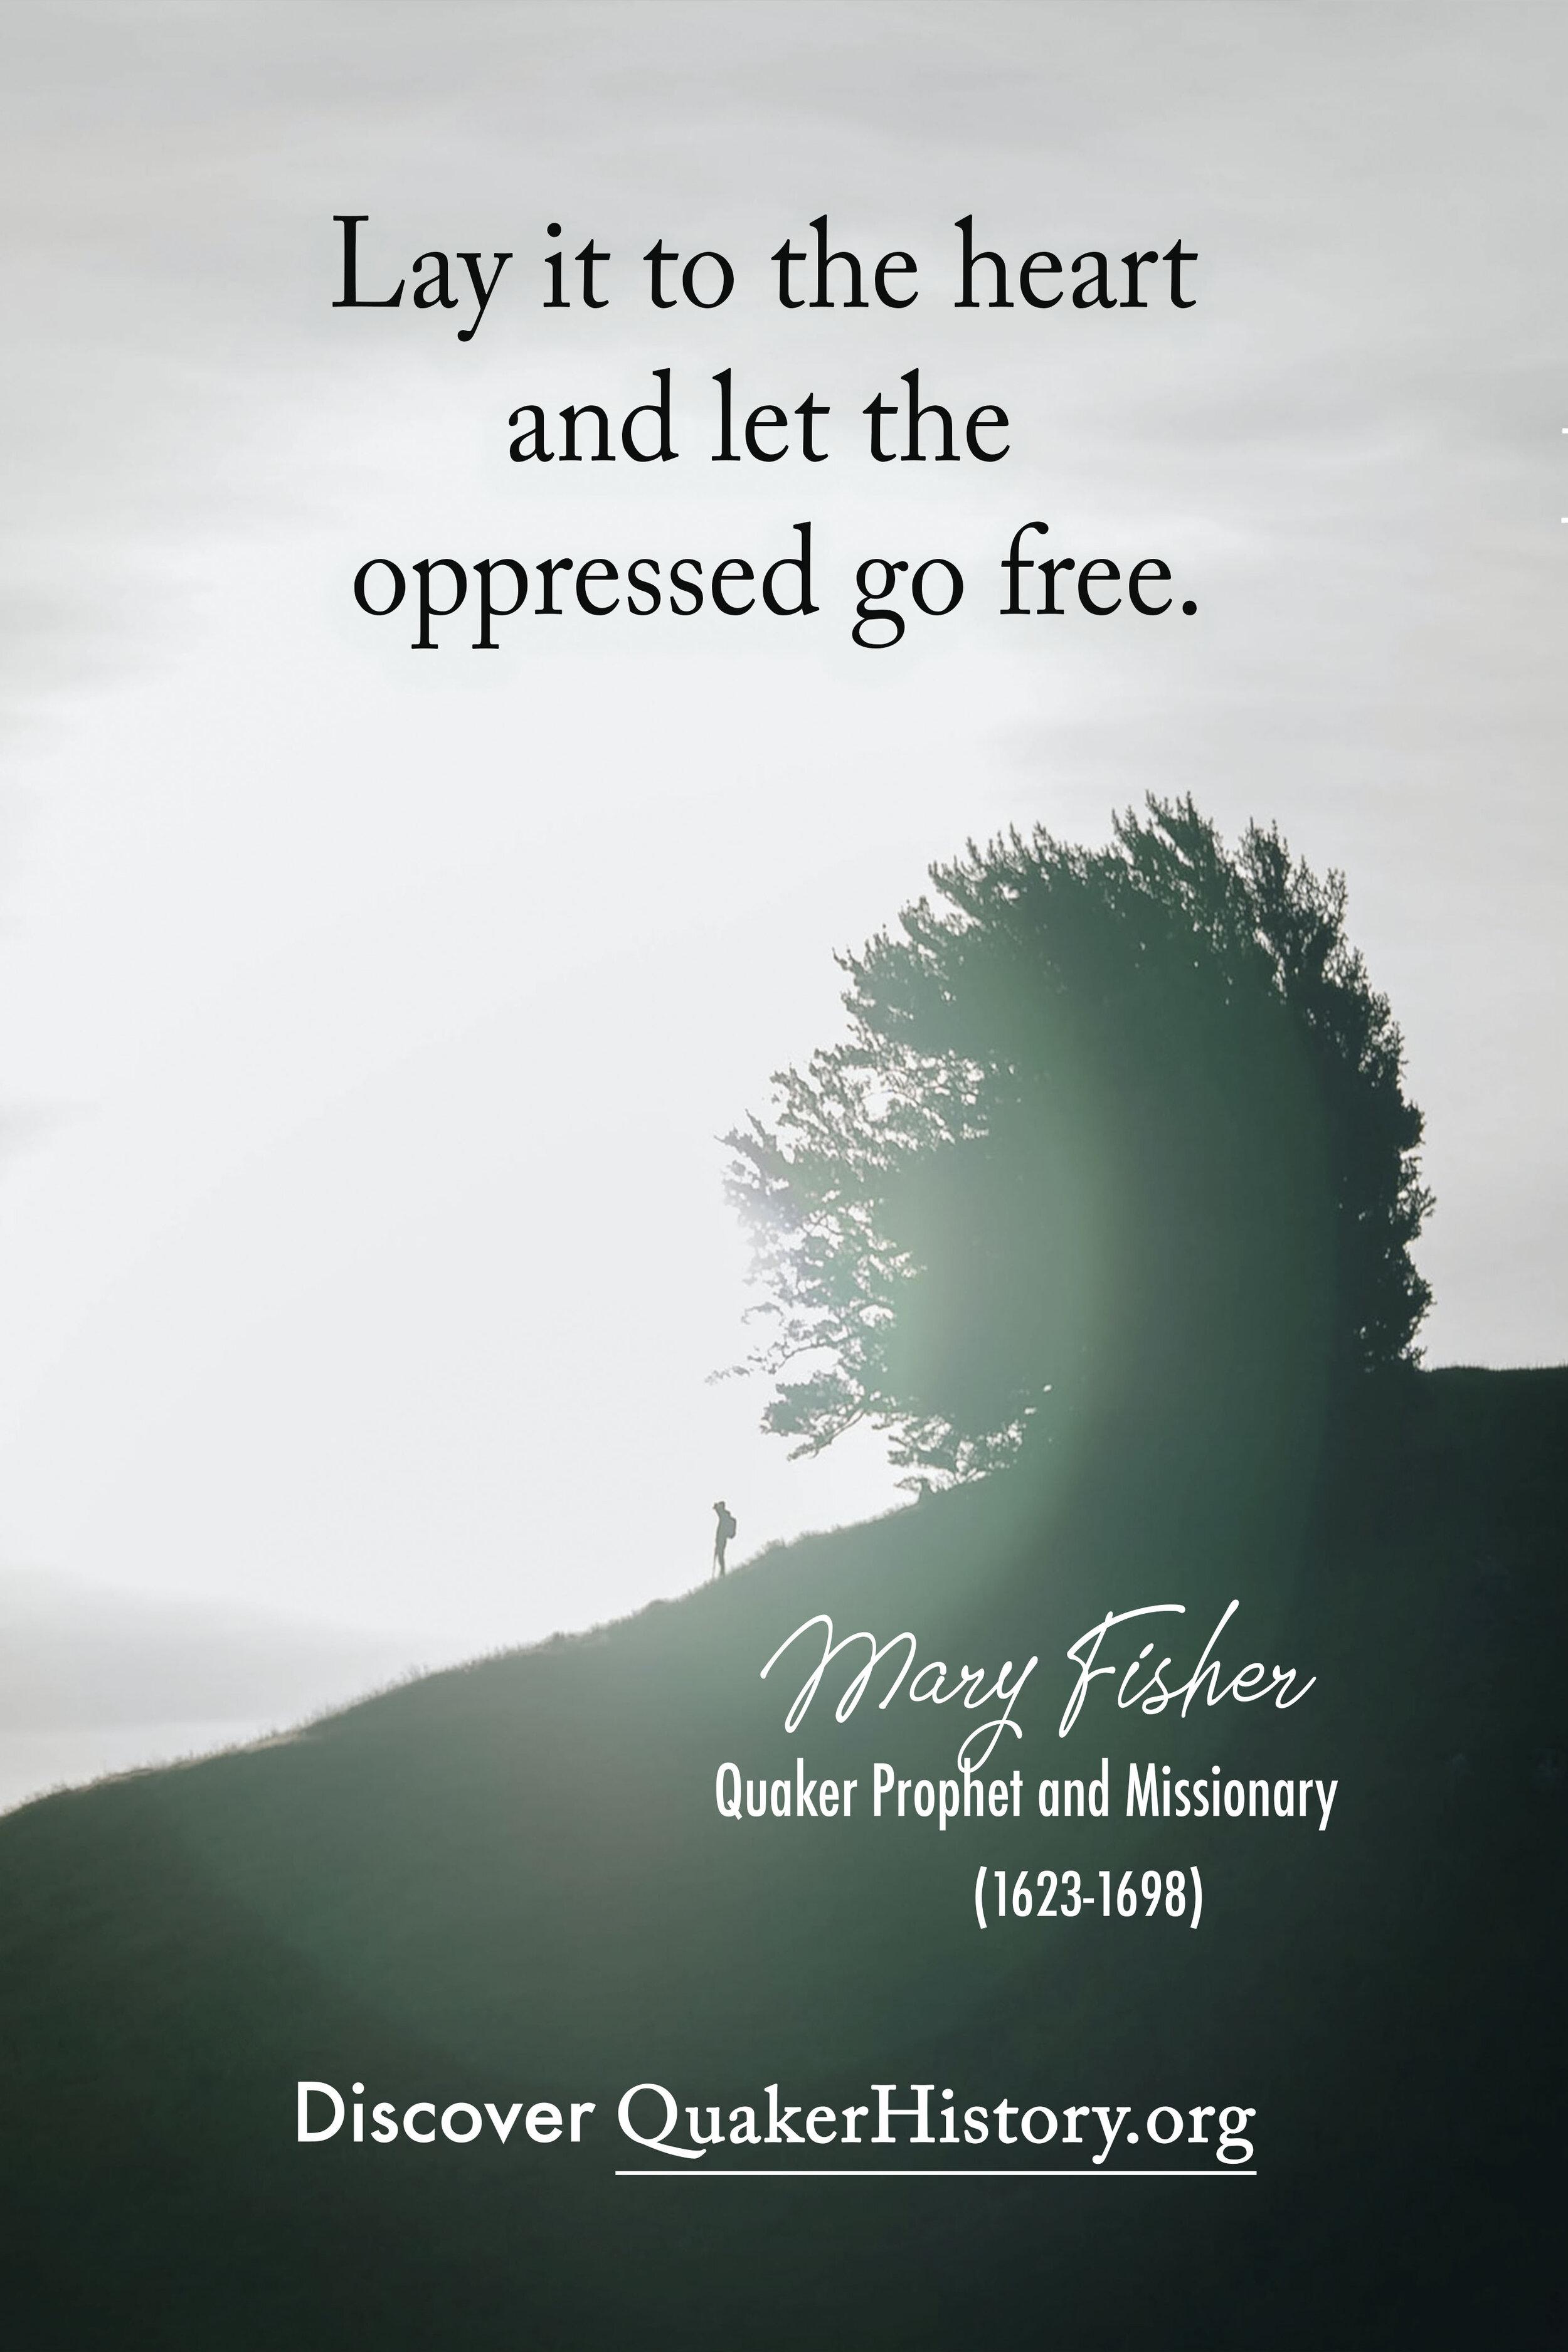 Quaker Quotes — Friends Historical Association